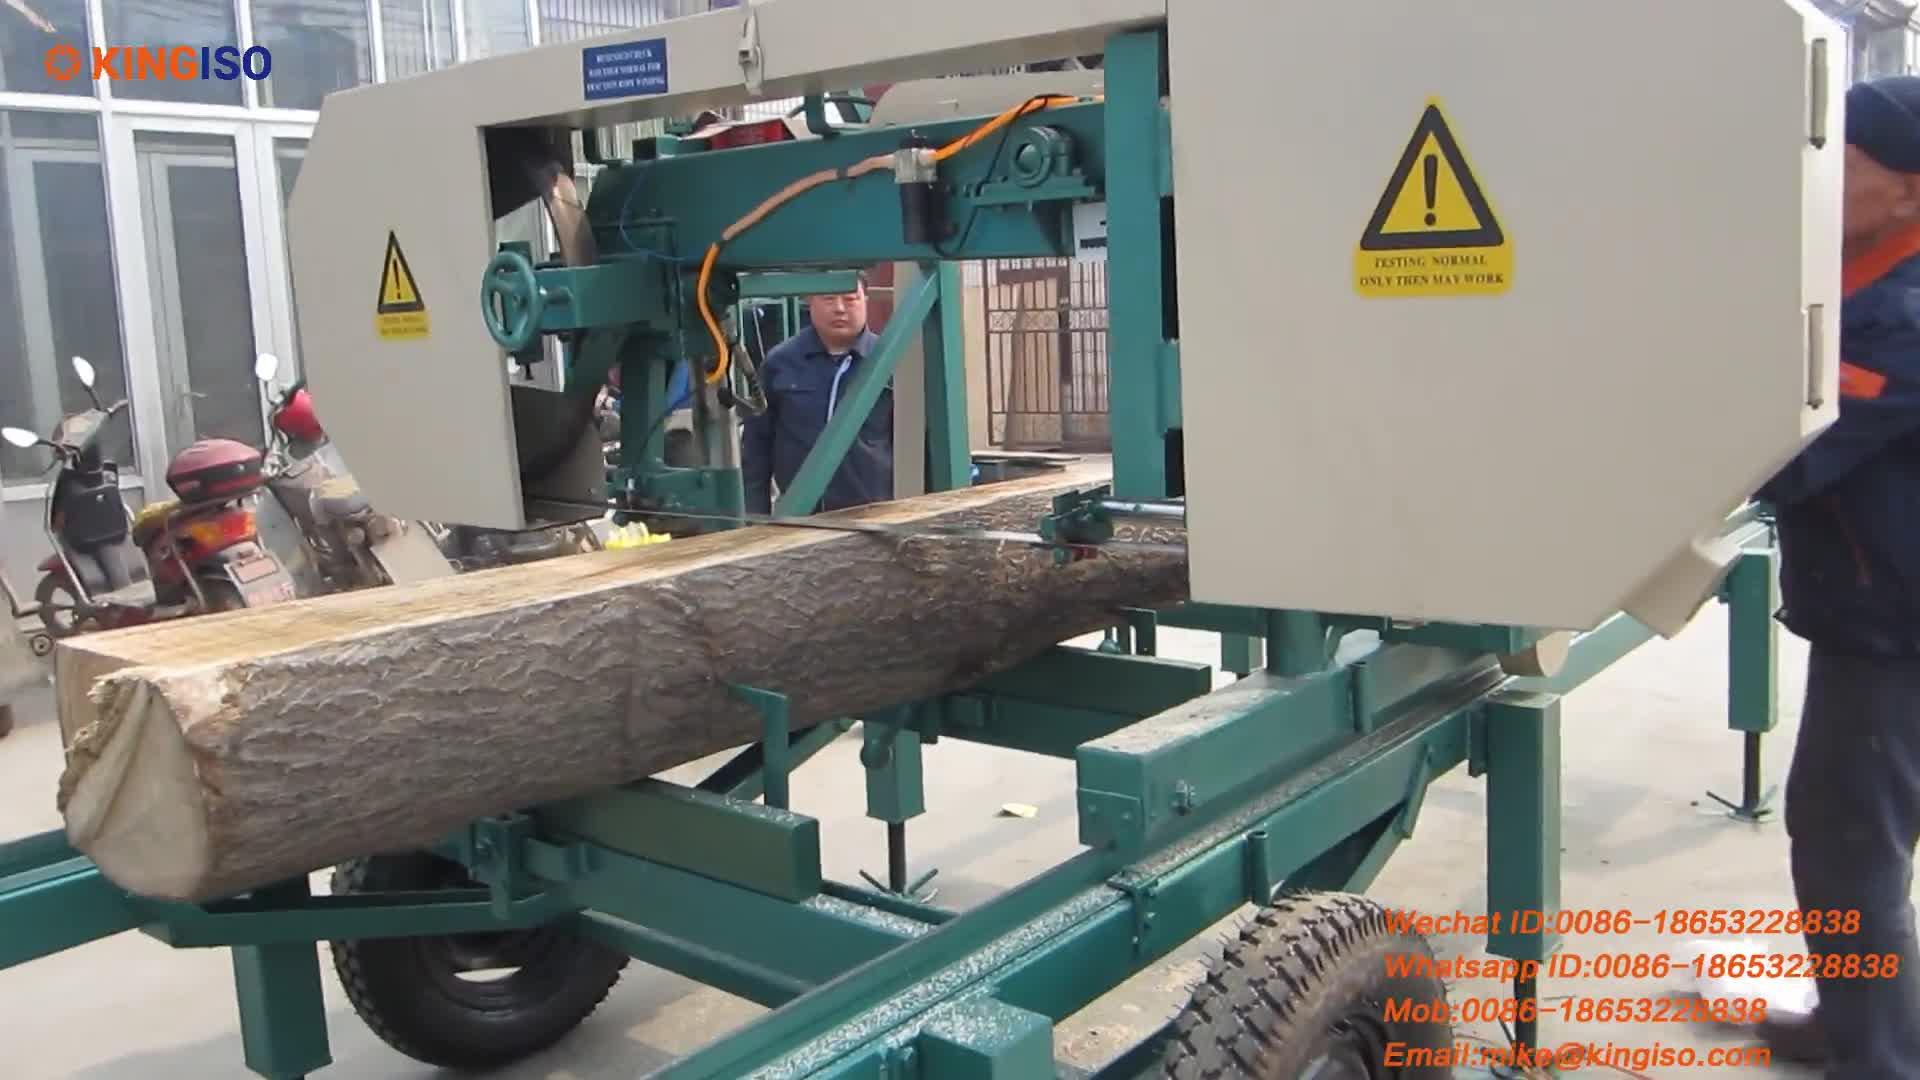 MJ800 diesel Horizontal portable band sawmill